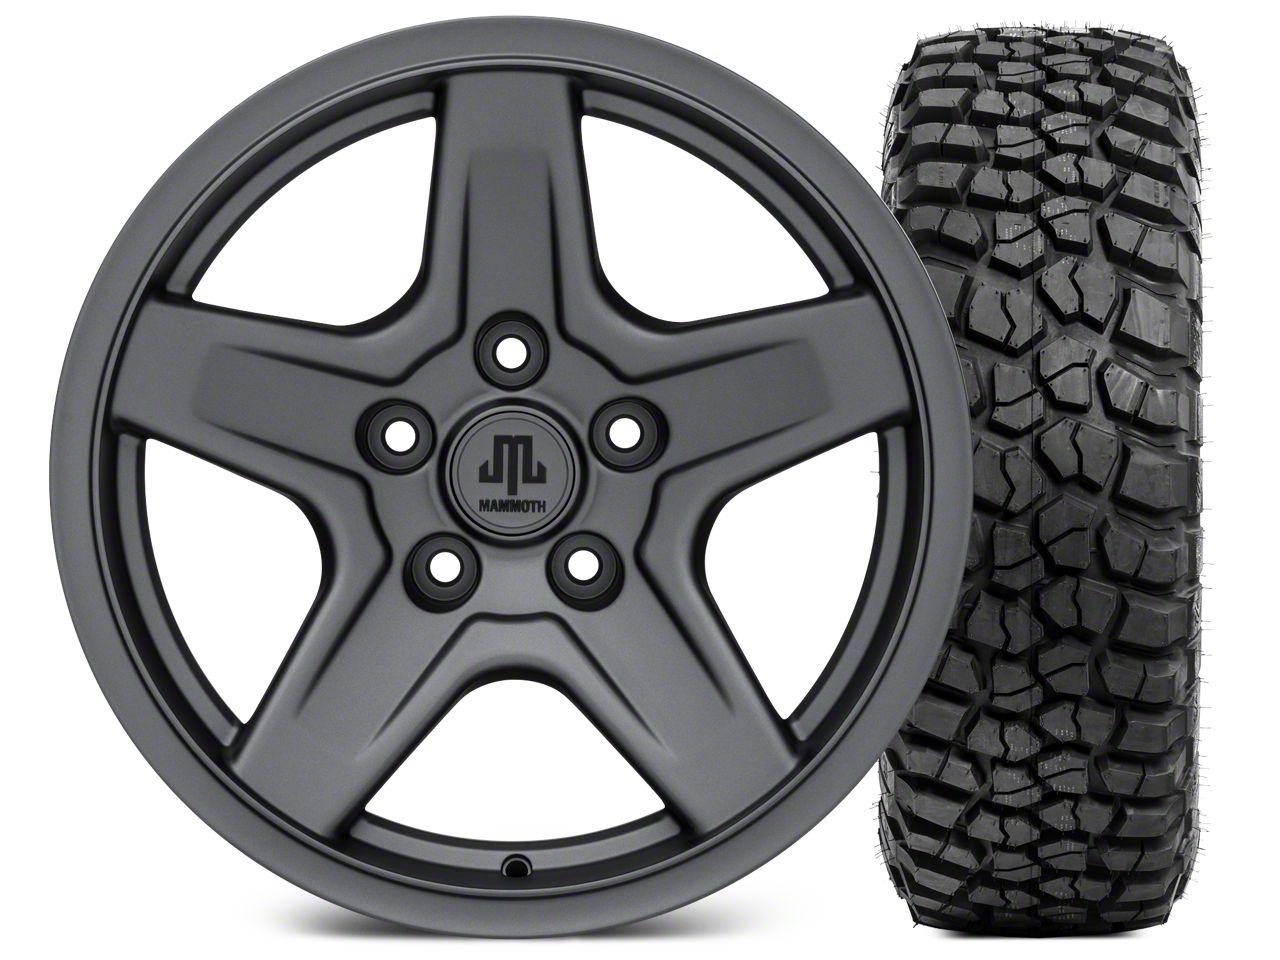 Mammoth Boulder Charcoal Wheel - 17x9 and BFG KM2 Tire 305/70- 17 (07-18 Jeep Wrangler JK)